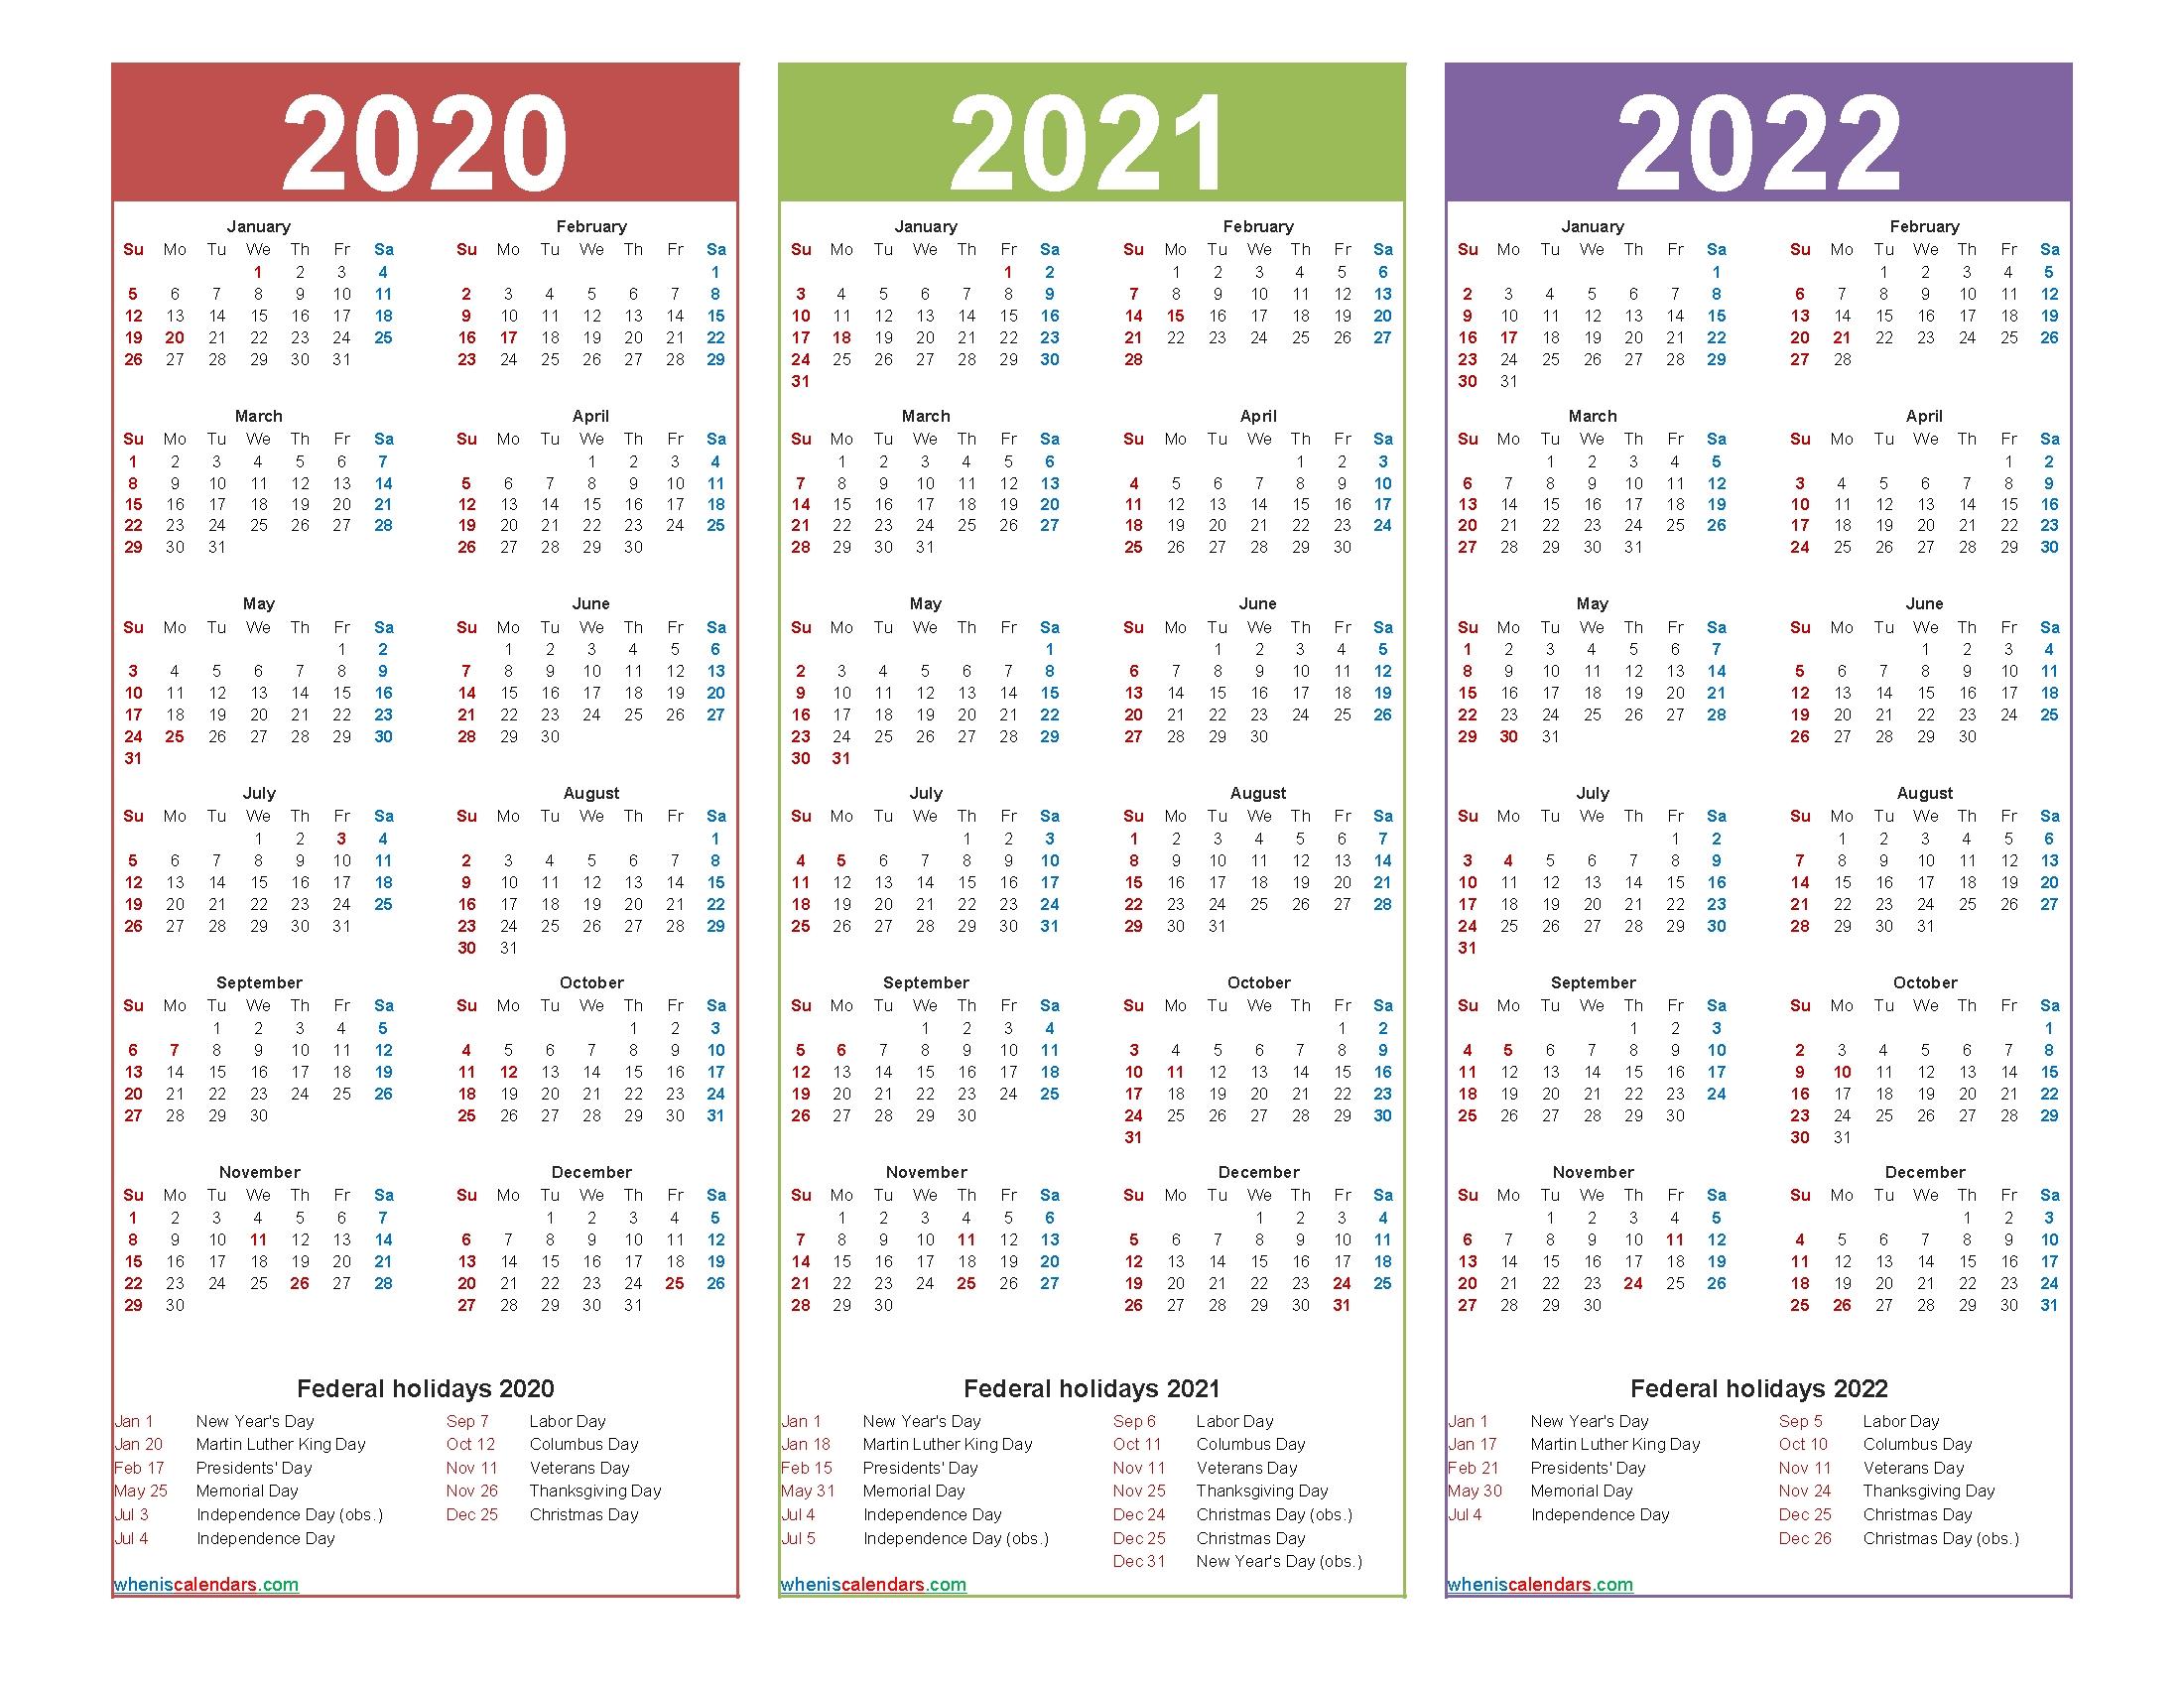 3 Year Calendar 2020 To 2022 Calendar With Holidays